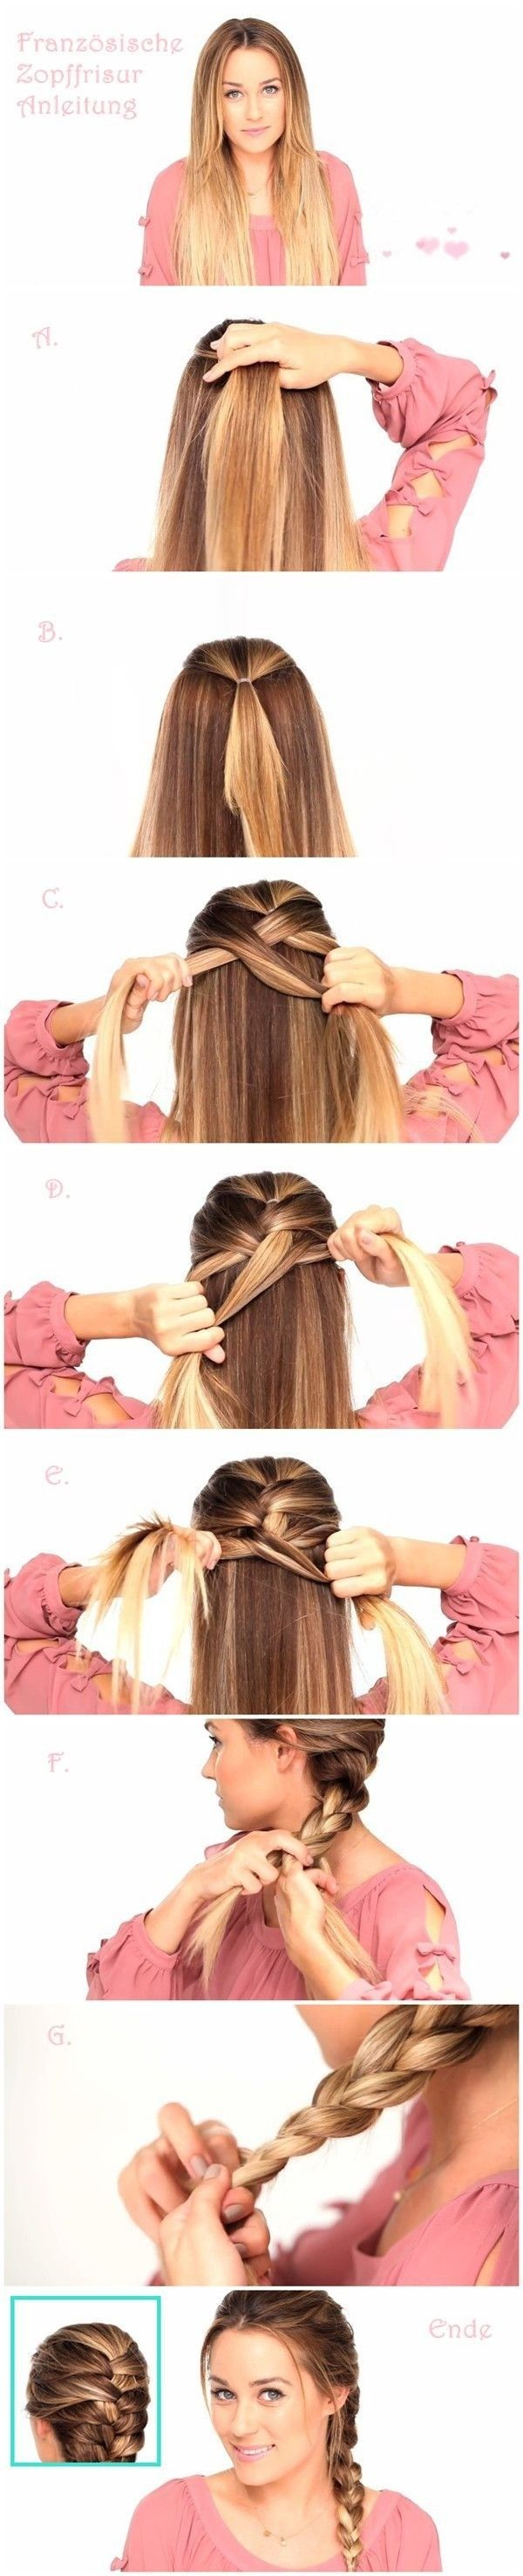 Anleitung Pony Braid... #Anleitung #Braid #Pony